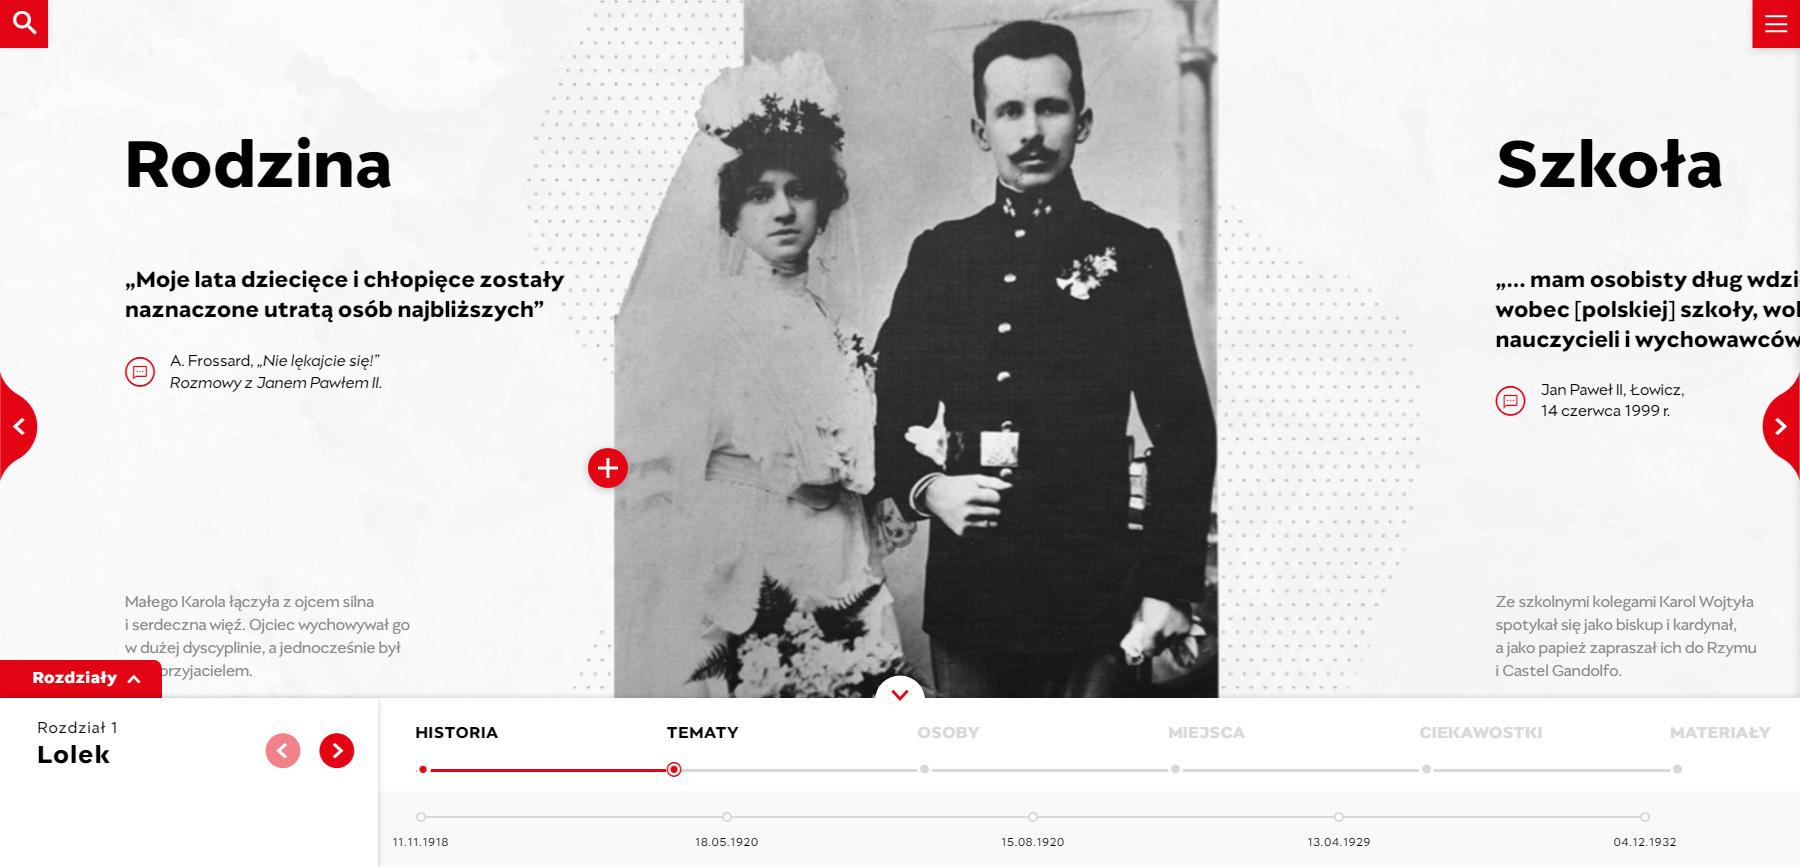 Biogram JP2 Online - Website of the Day